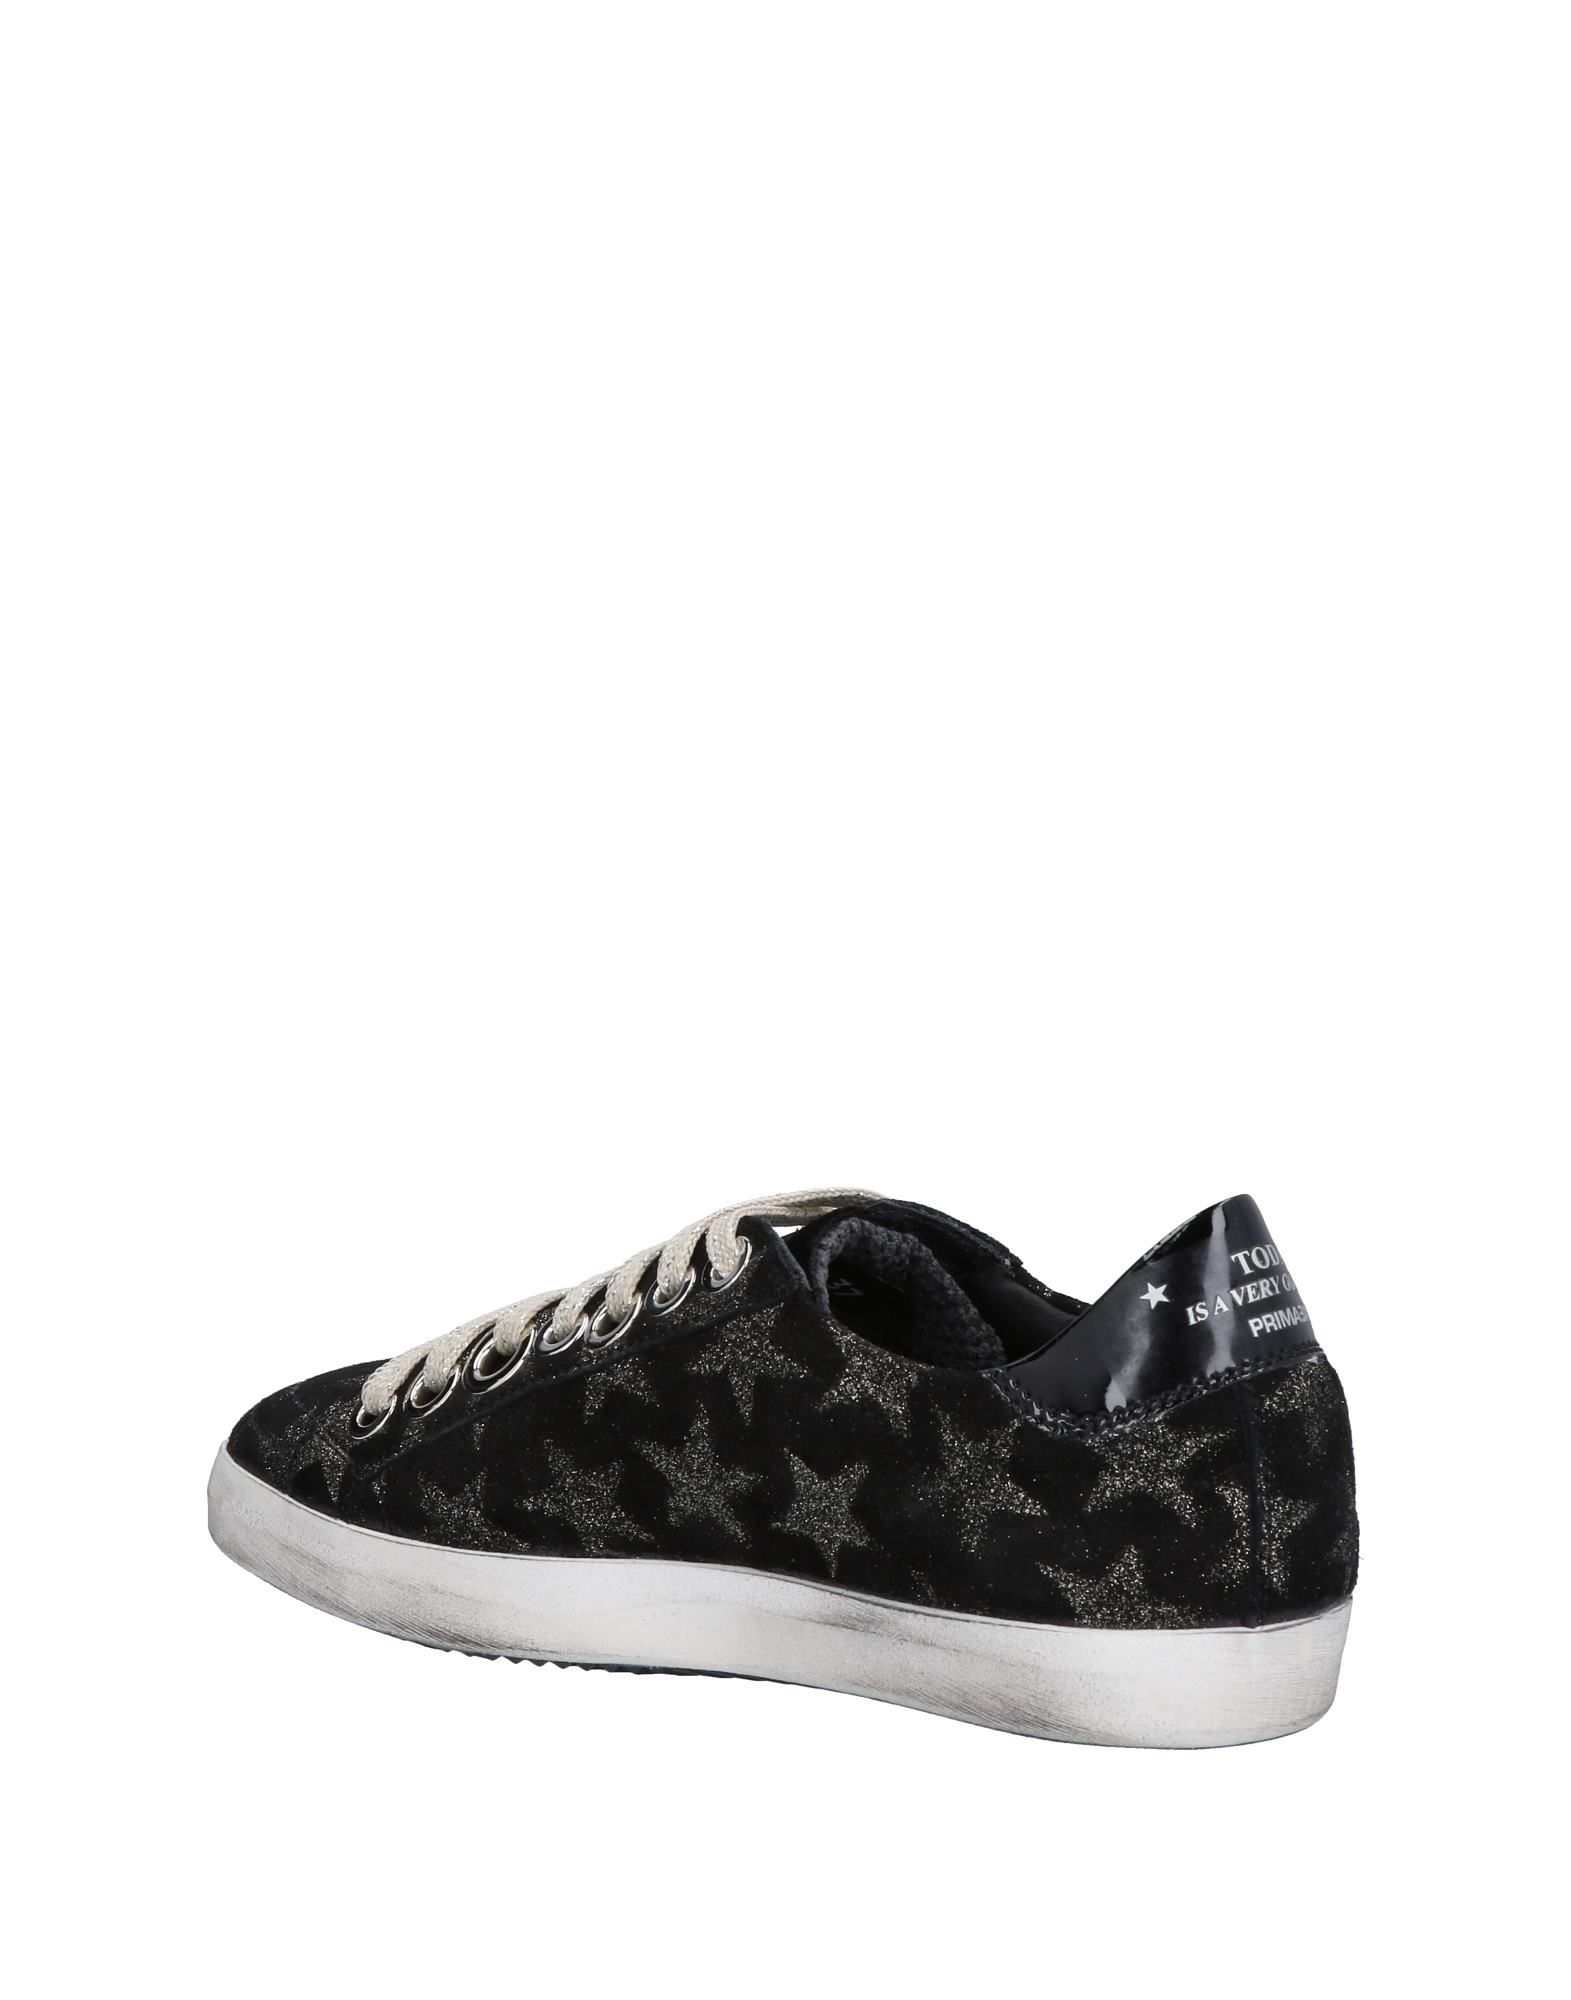 Stilvolle billige Schuhe Damen Primabase Sneakers Damen Schuhe  11474011WN f9d885